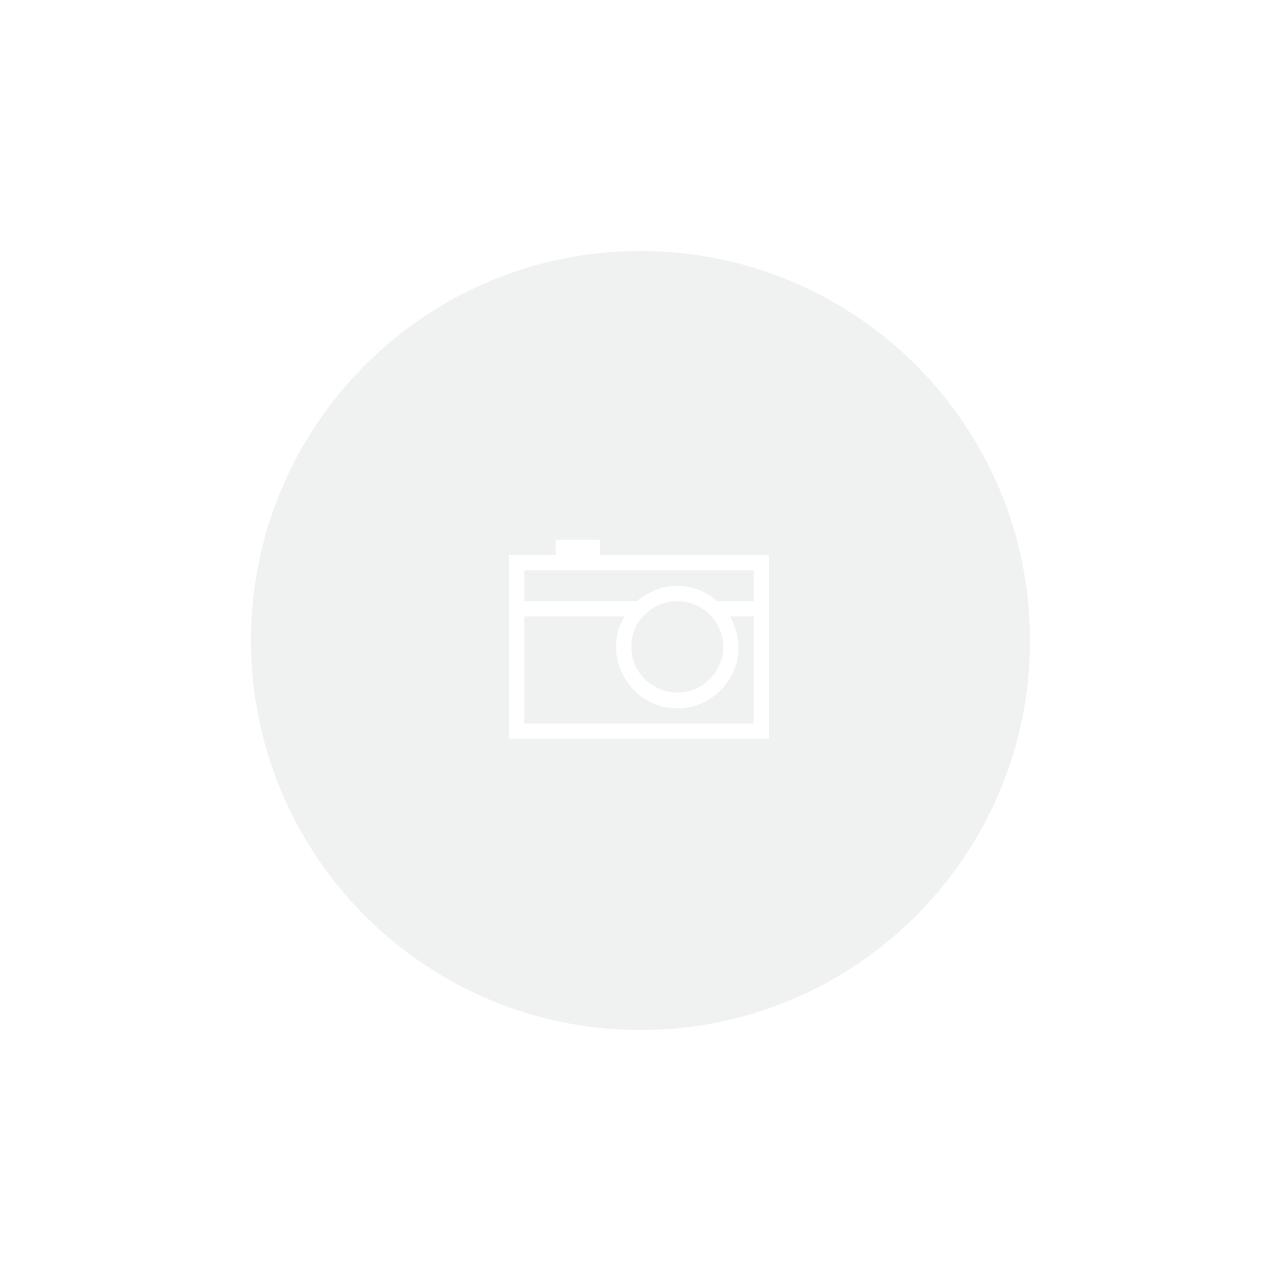 Papel Artesanal Indiano - Ref. 62